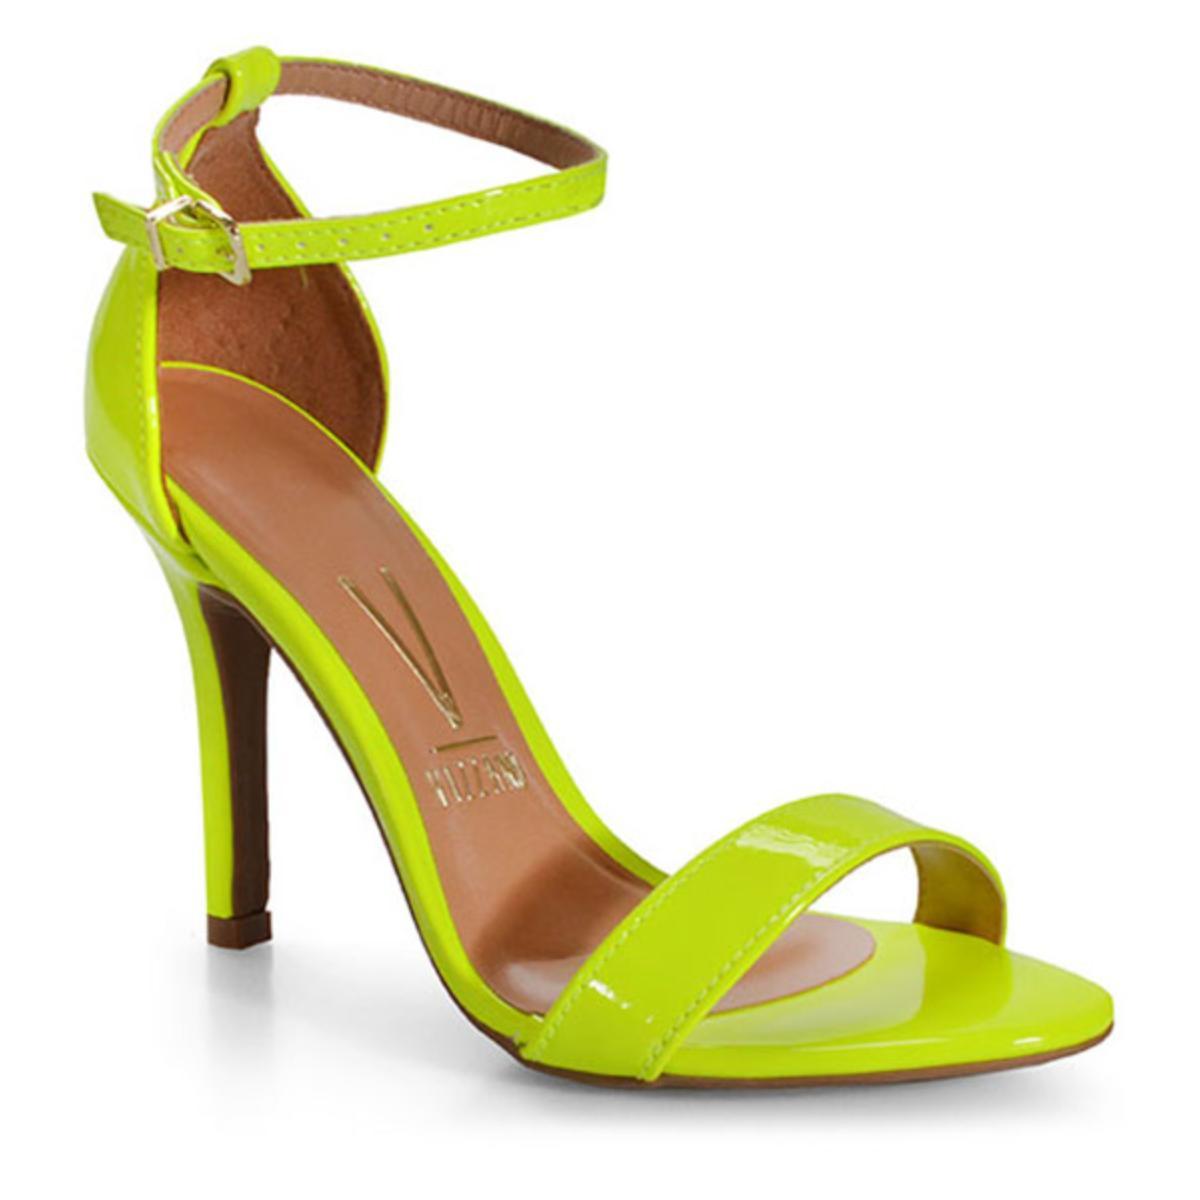 Sandália Feminina Vizzano 6249152 Amarelo Fluor